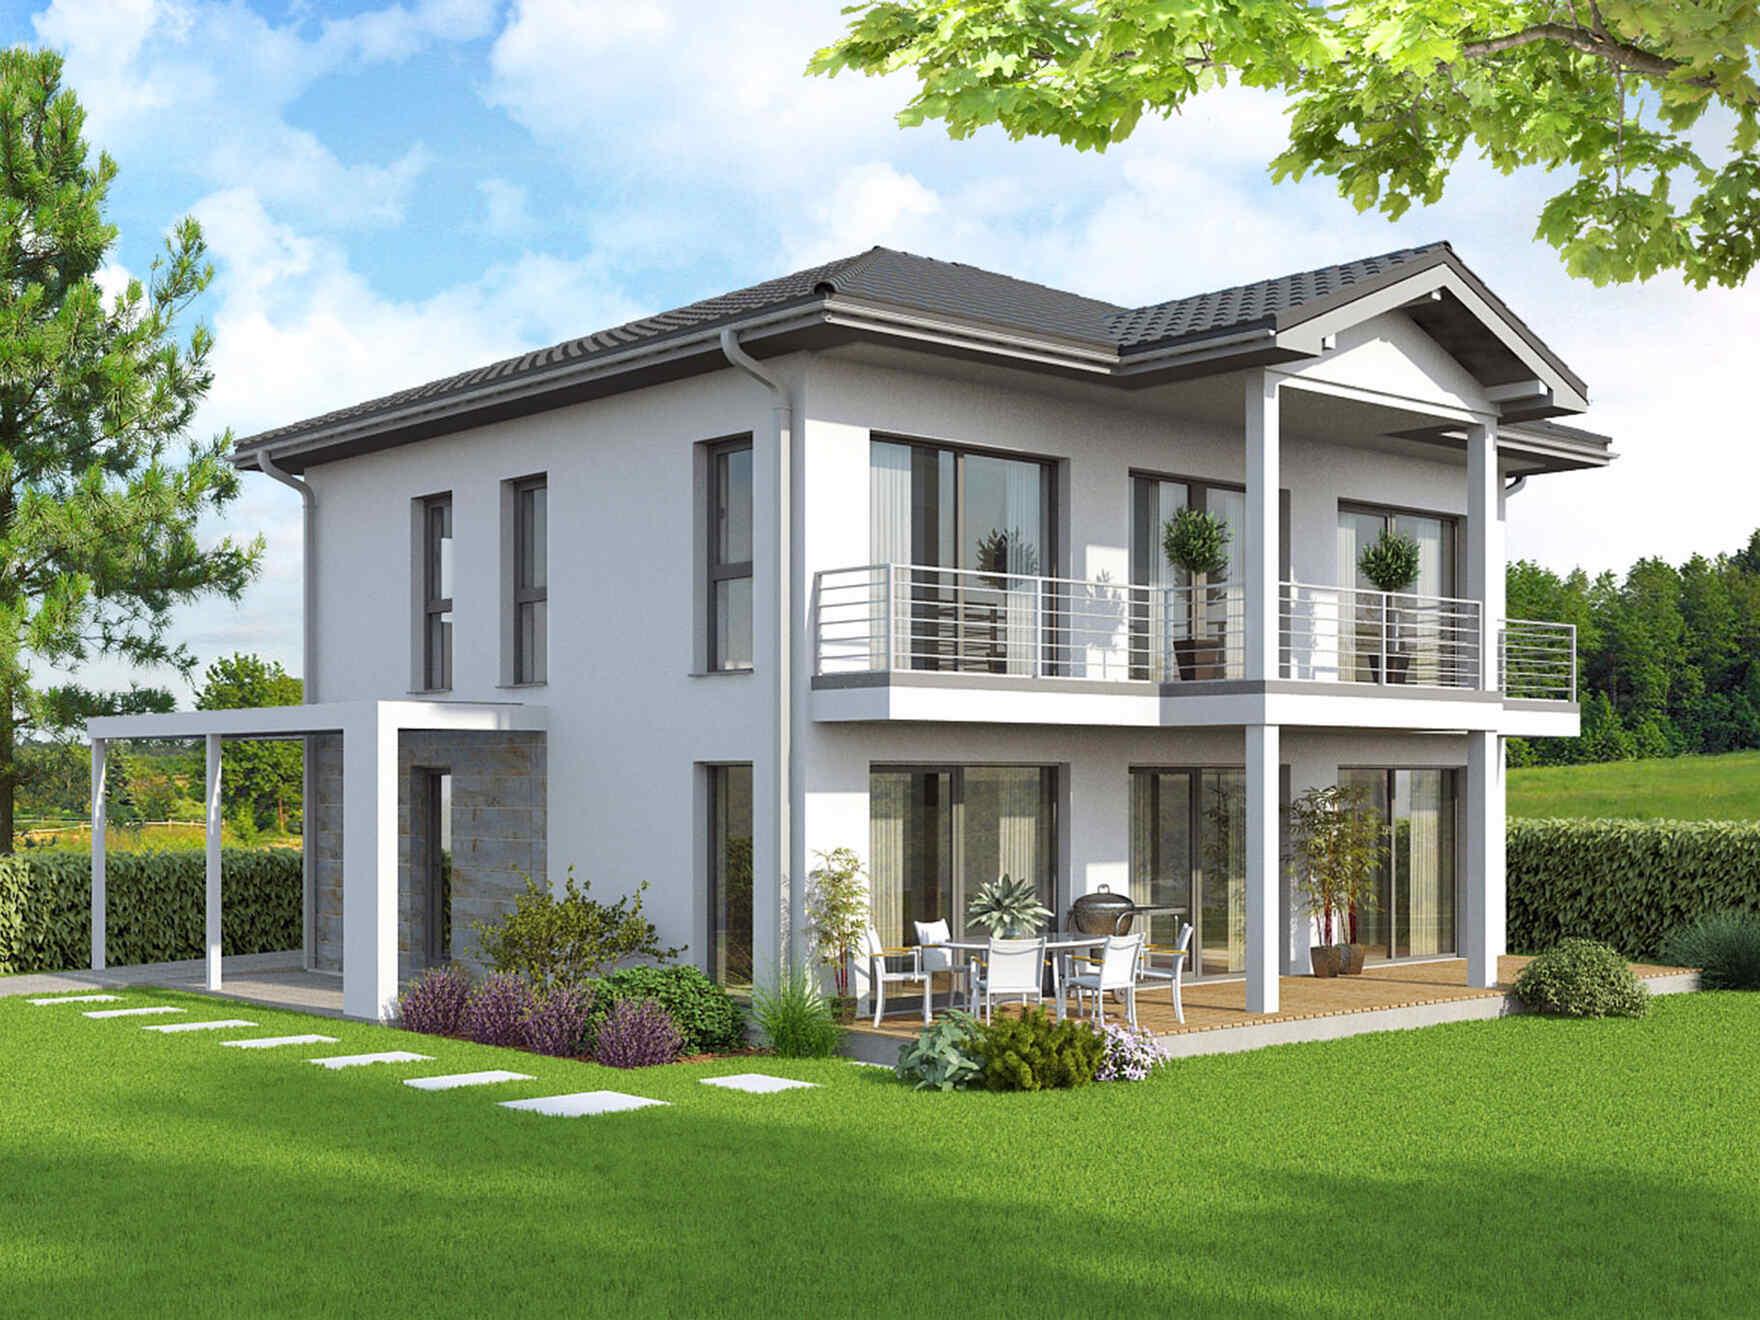 Tiny House Design: Fertighaus Preisliste